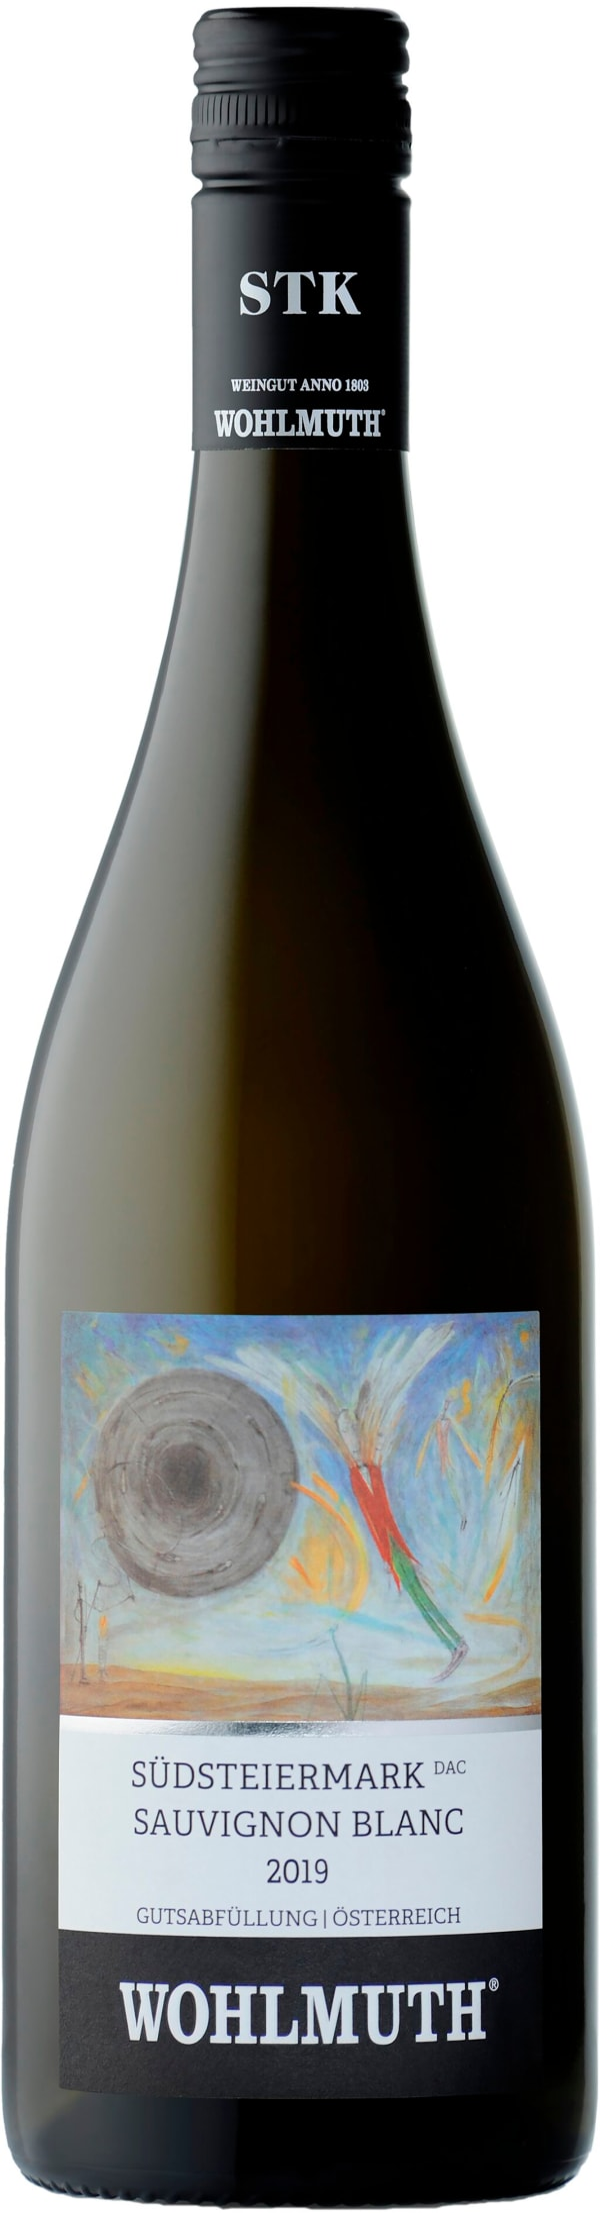 Wohlmuth Sauvignon Blanc Klassik 2016